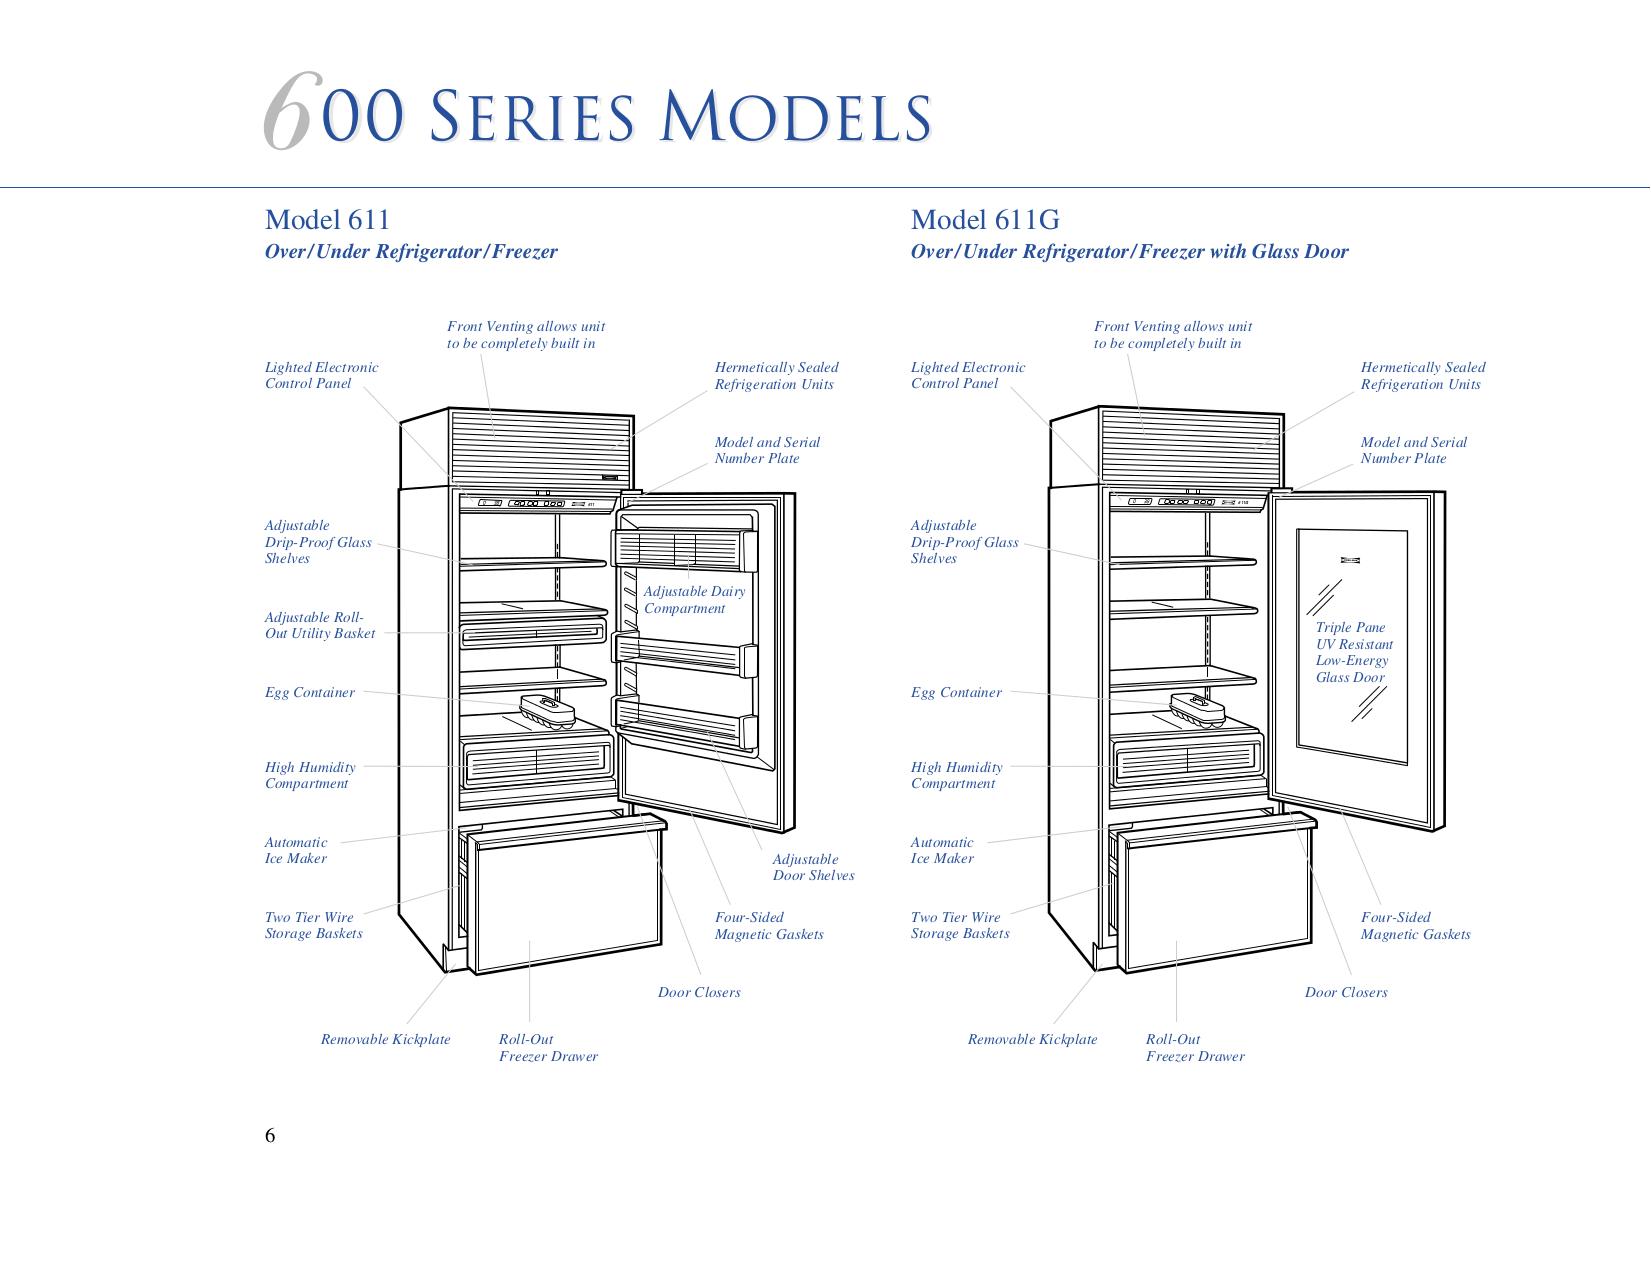 pdf manual for wolf refrigerator sub zero 642 rh umlib com Sub-Zero 650 Indicator Light Sub-Zero 650 Parts Diagram